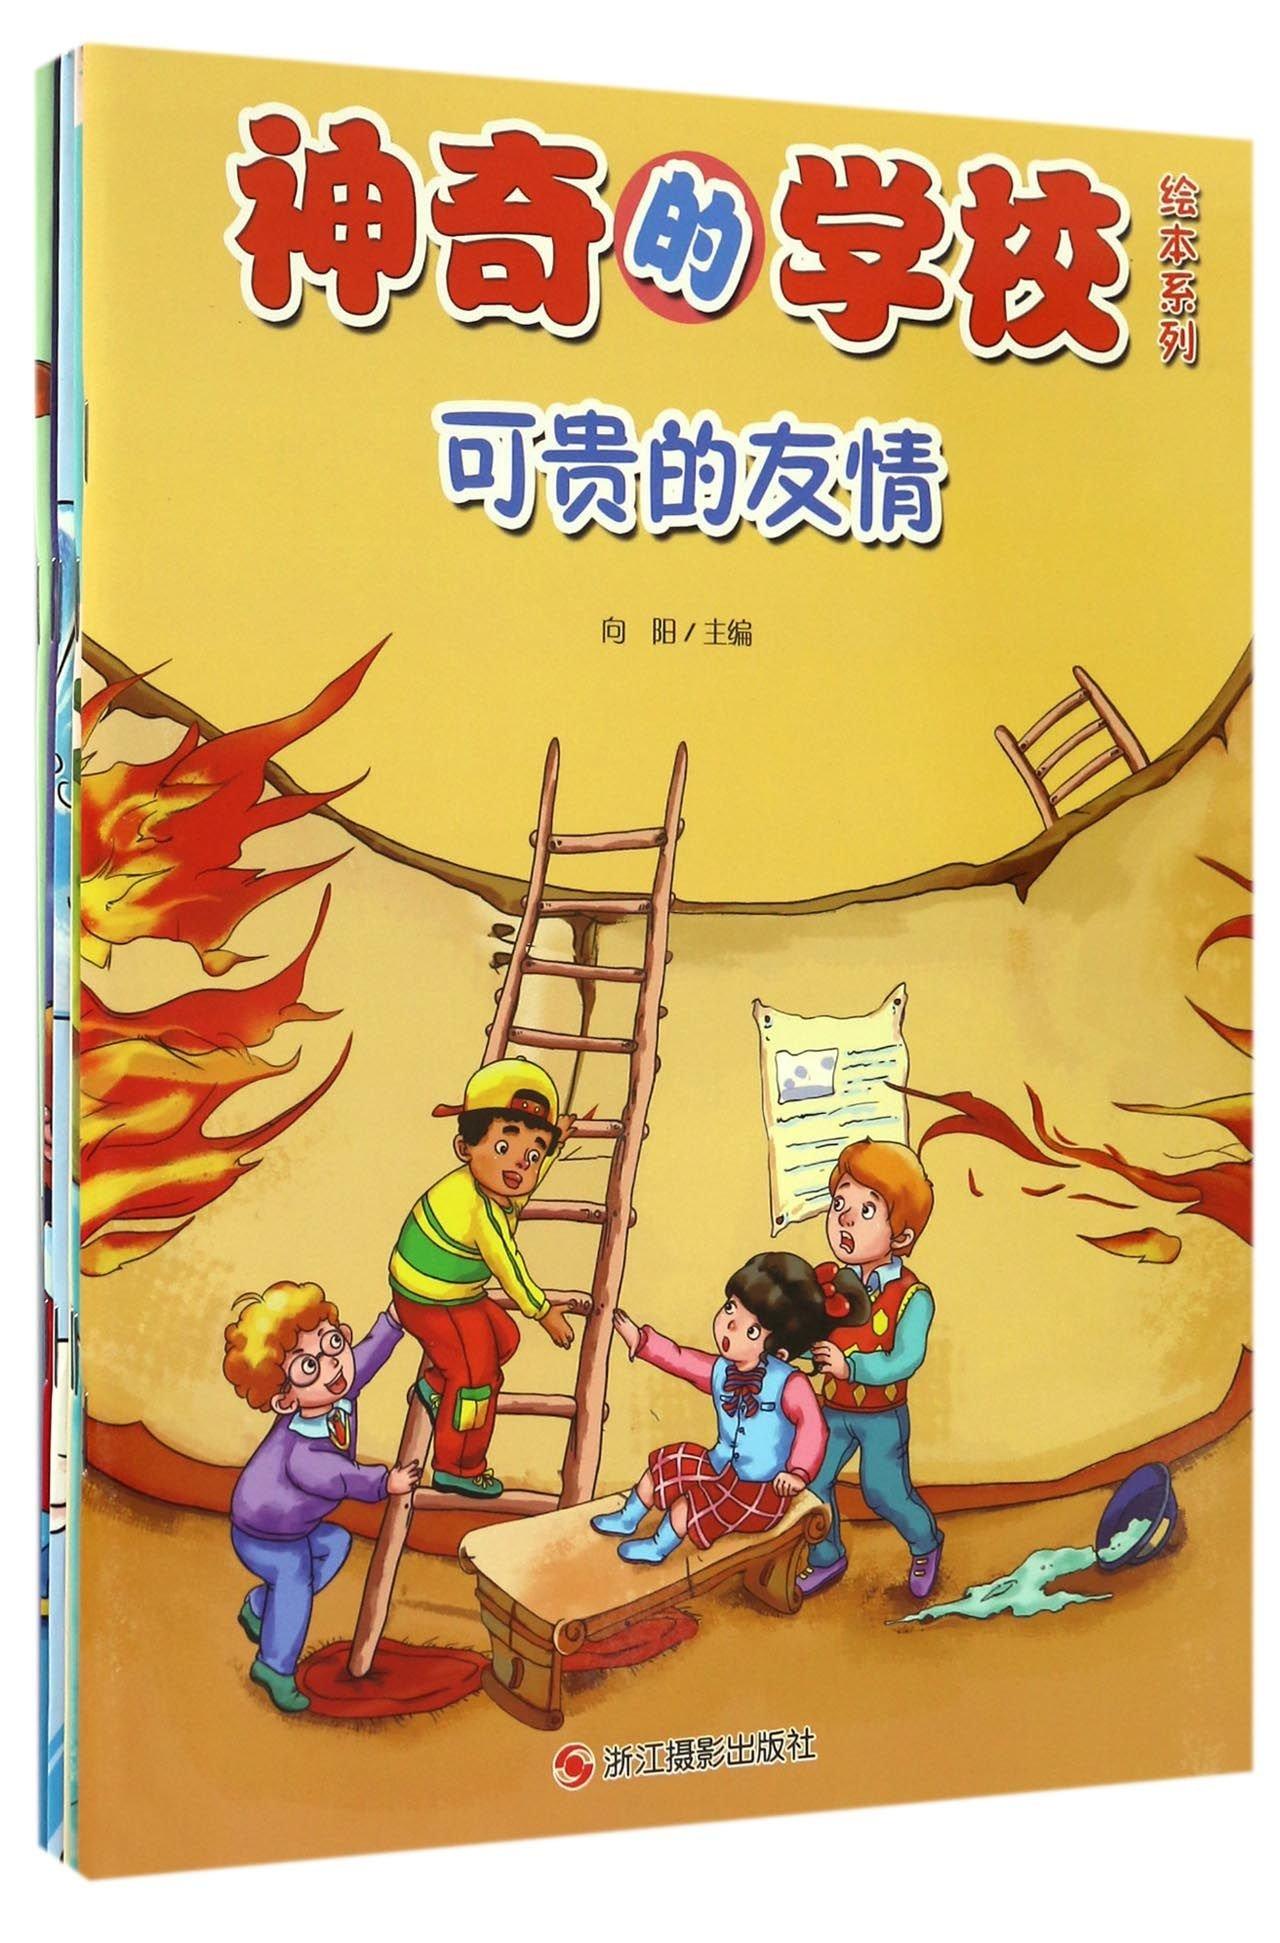 The Magic School Chinese Edition Xiang Yang 9787551415415